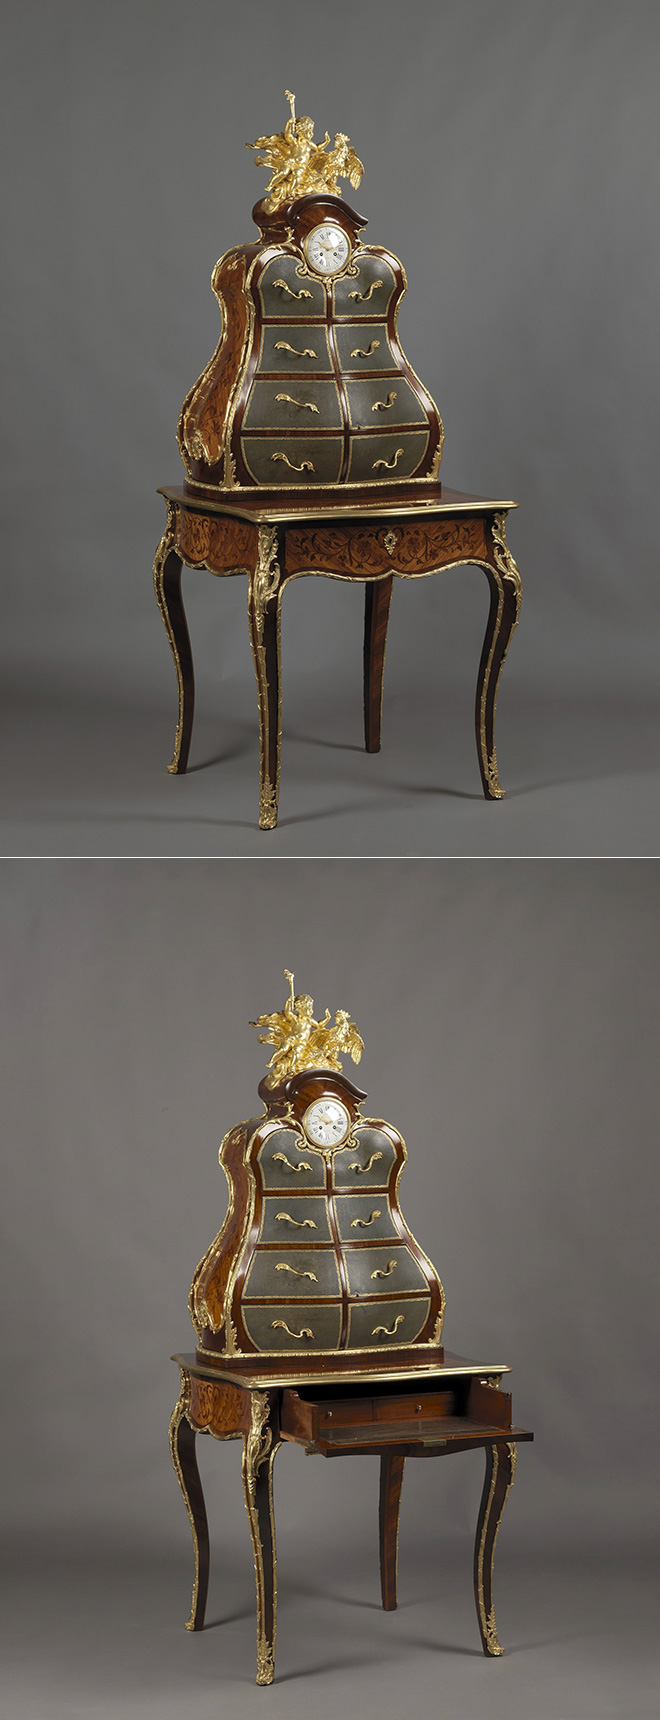 Secrétaire cartonnier vers 1880 style Louis XV - © Adian Alan